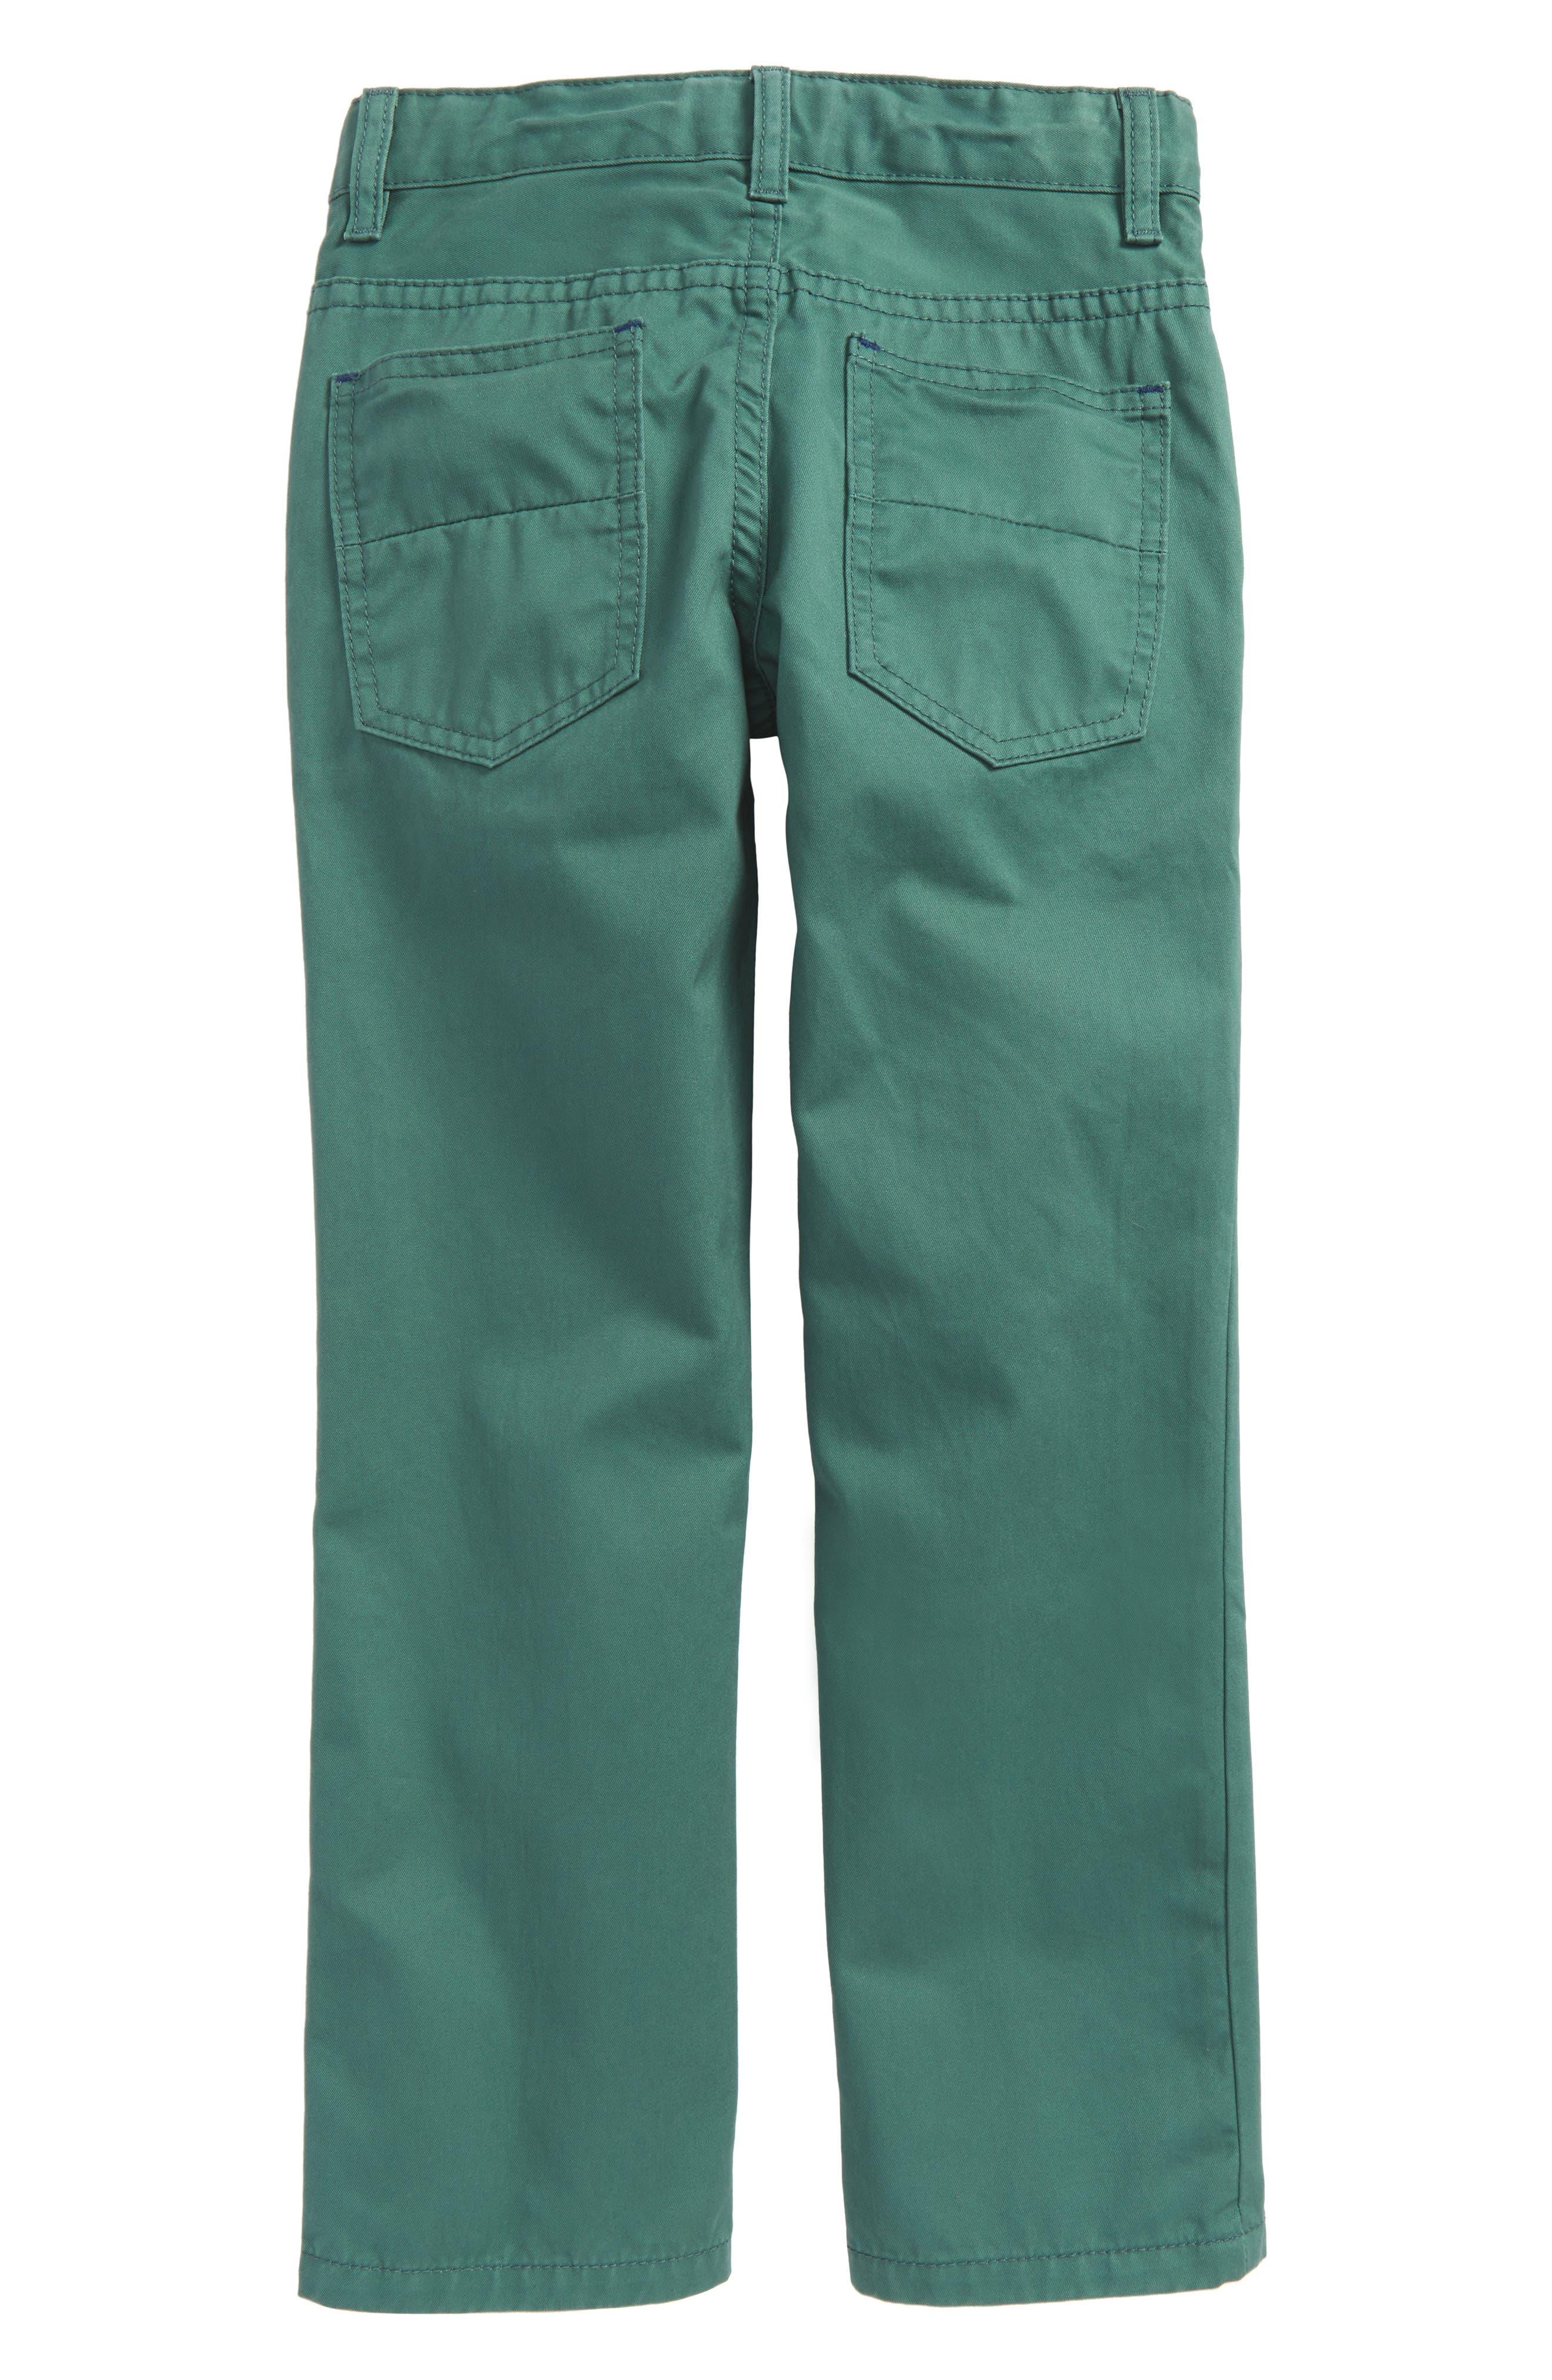 Slim Jeans,                             Alternate thumbnail 2, color,                             304